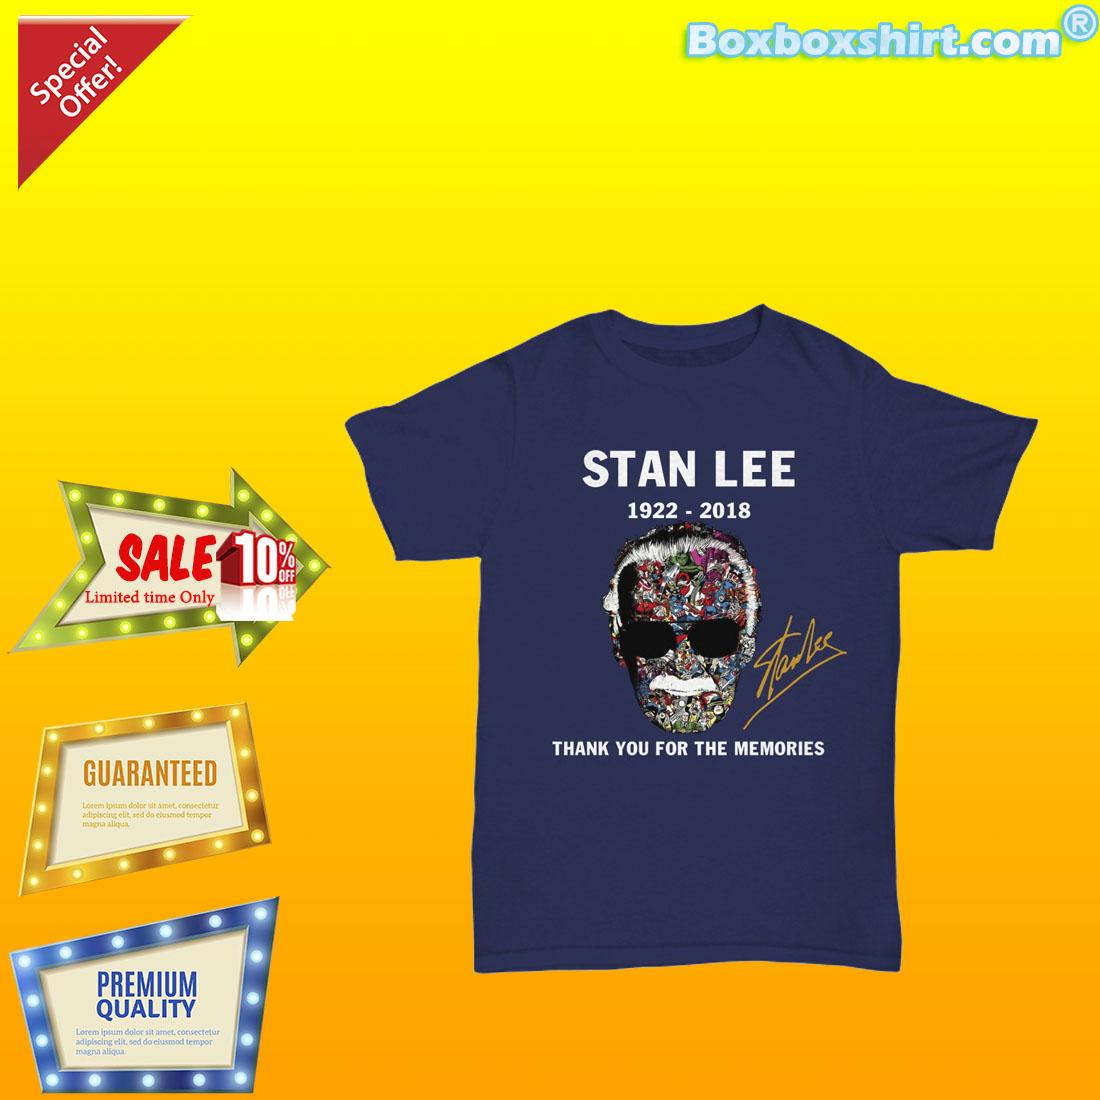 e8b4035b thank you for memories Stan Lee signature shirt and premium tee